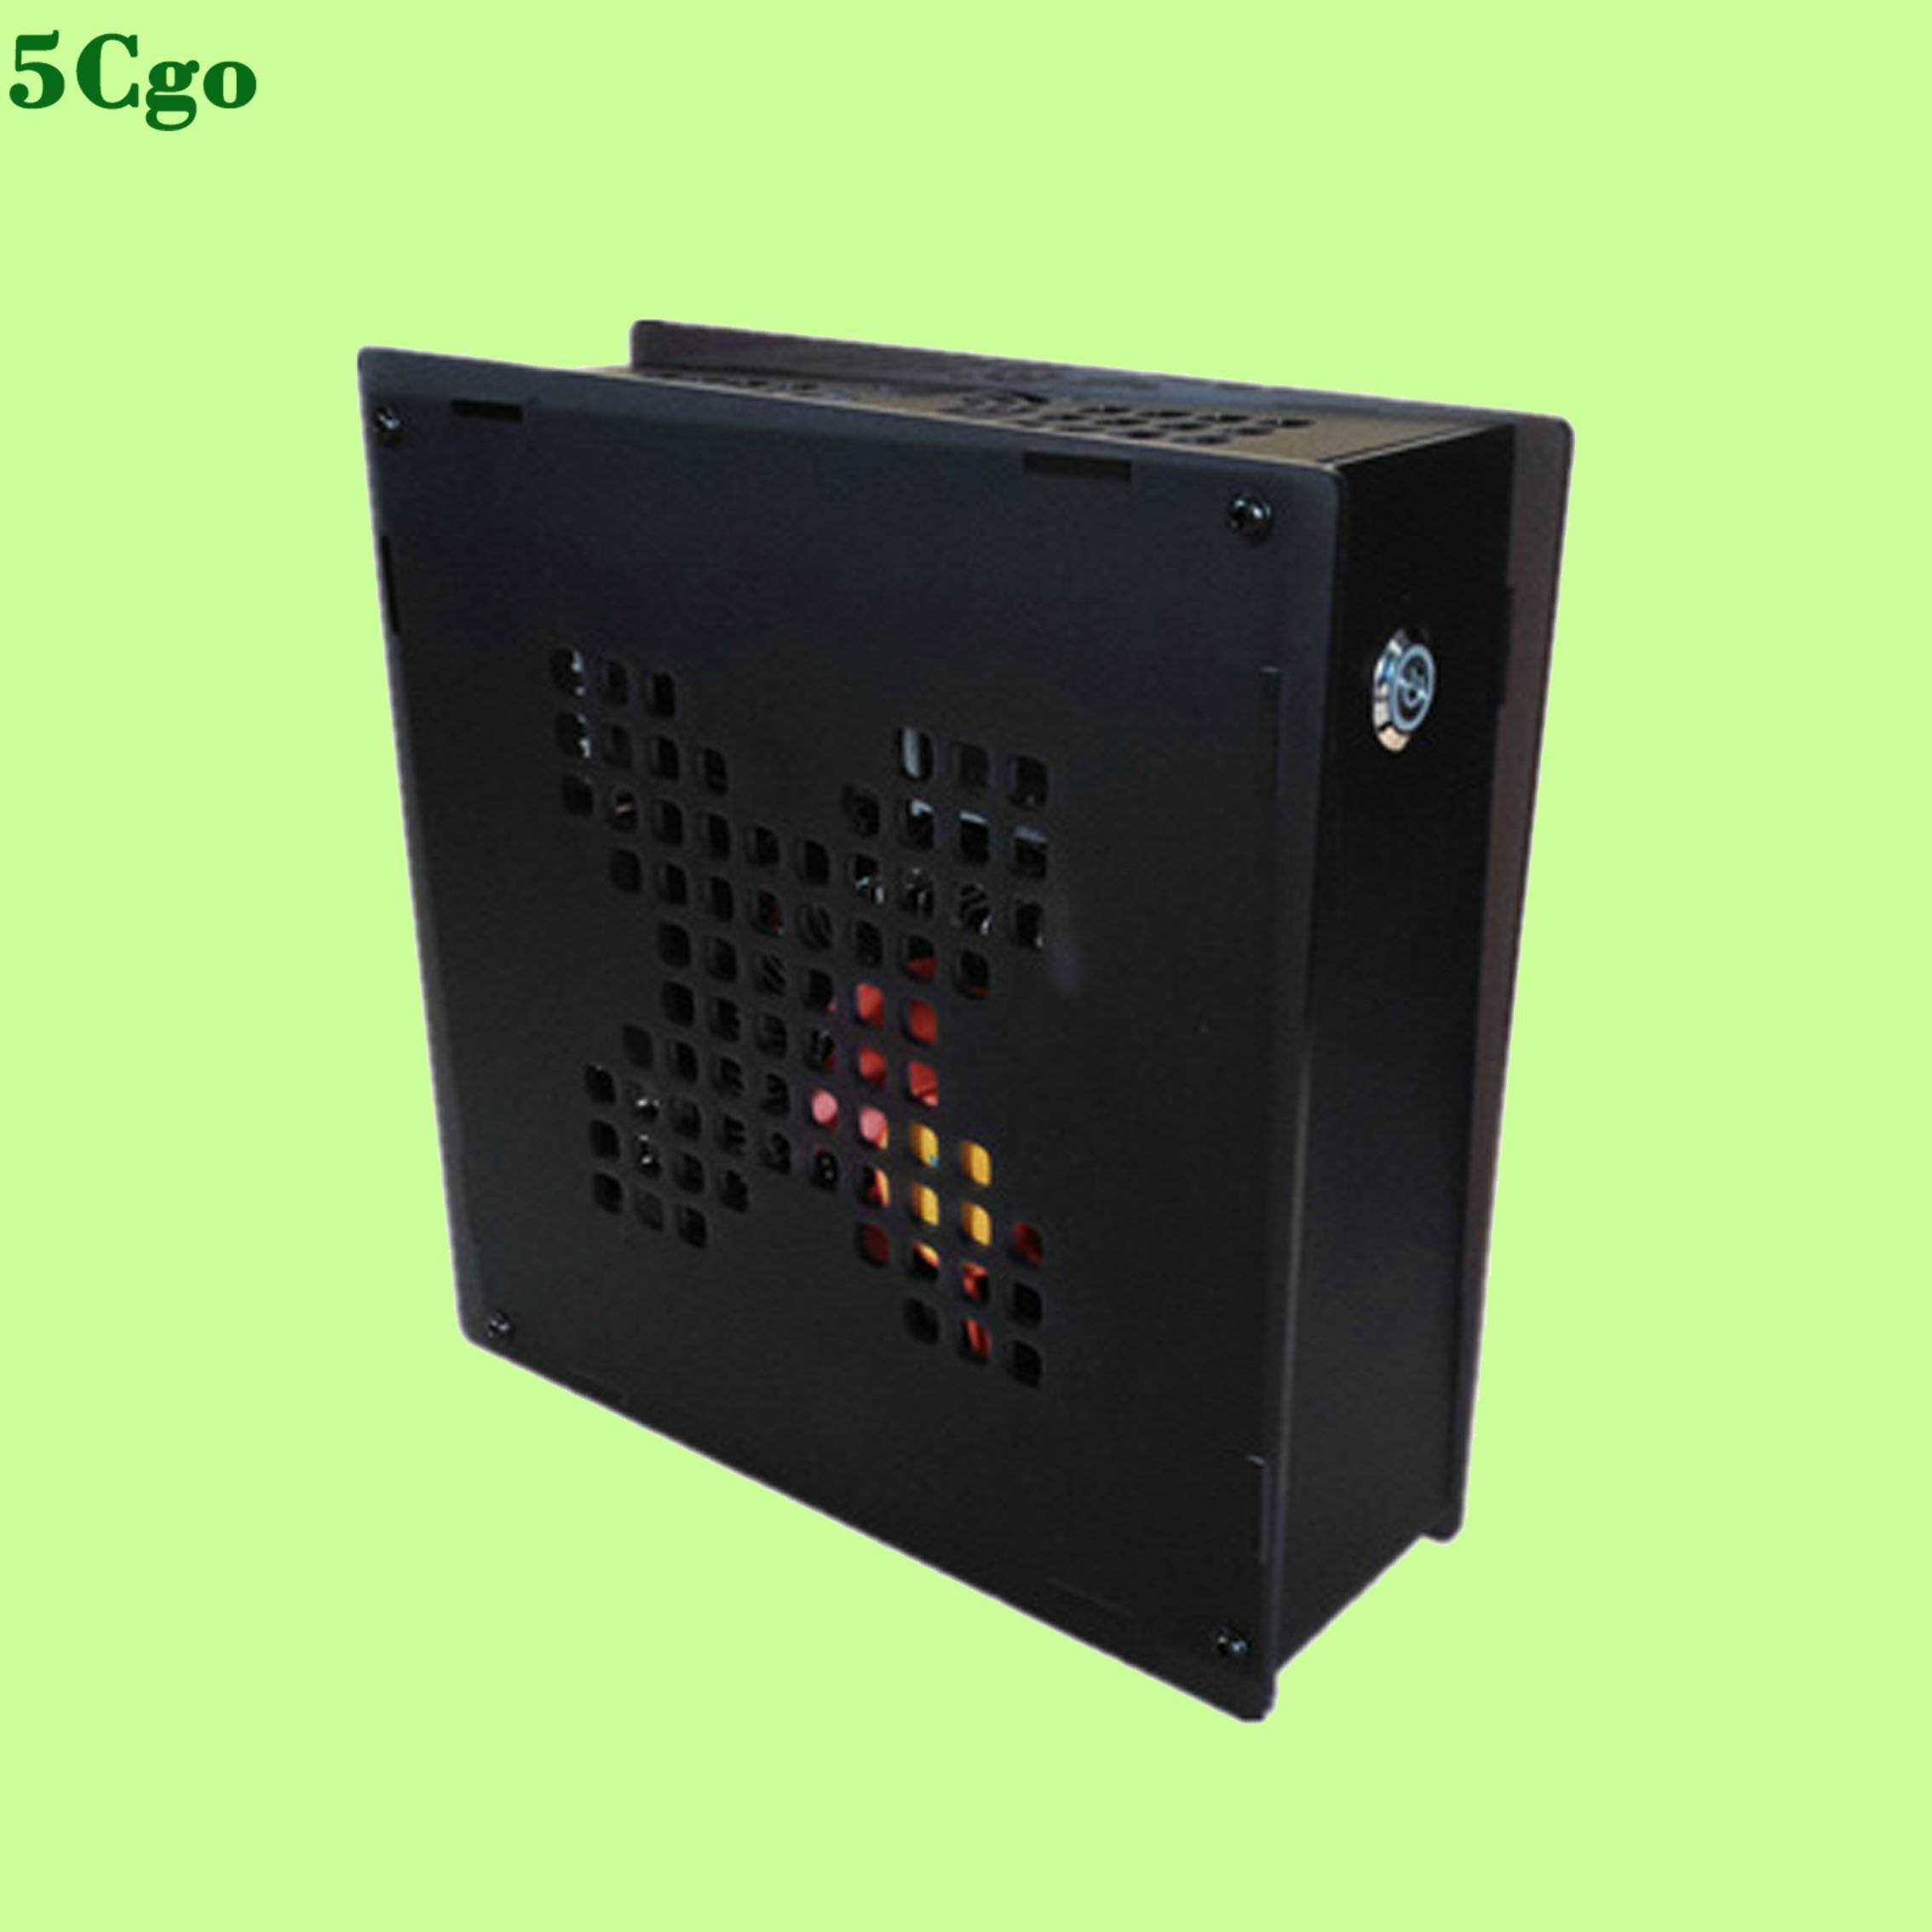 5Cgo【含稅】i5迷你電腦主機mini省電G1610微型4G網課1600家用辦公diy組裝H61主板遊戲LOL透明熒光